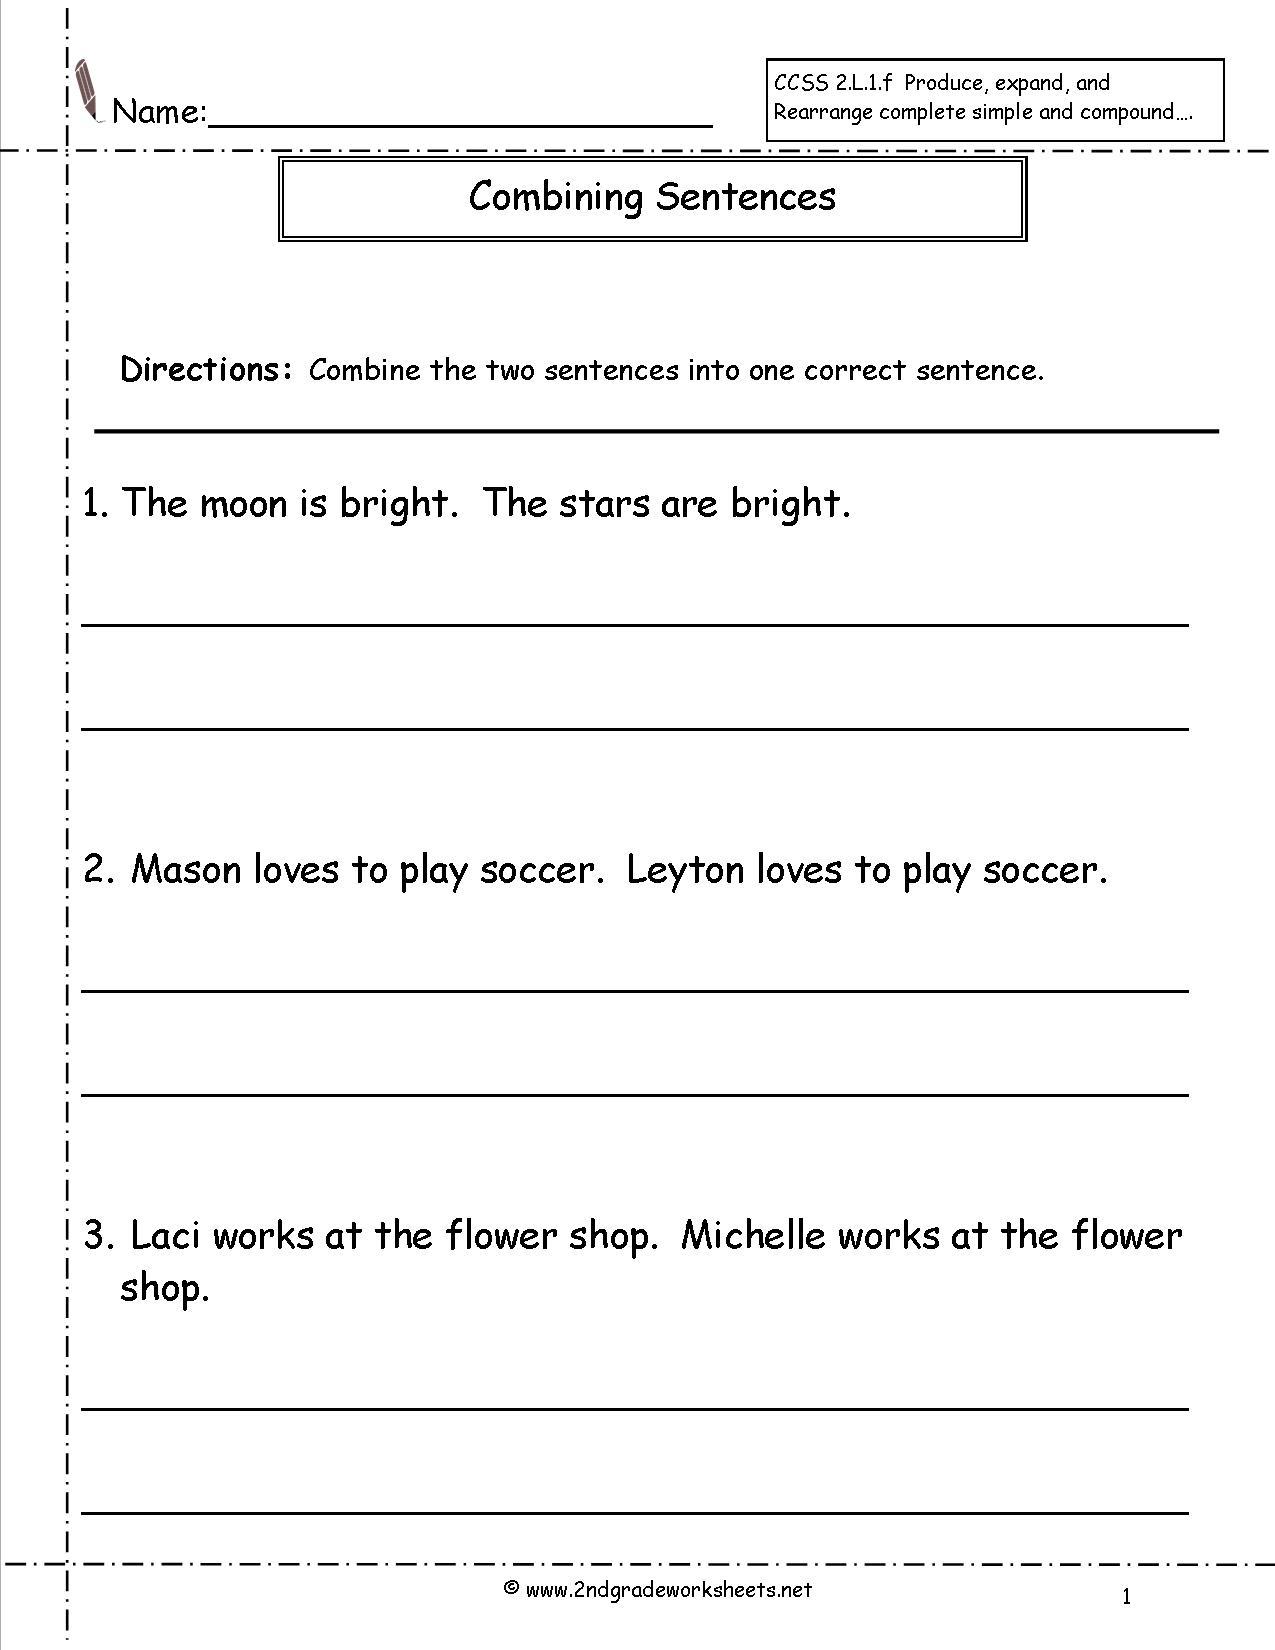 11 Best Images Of Combining Sentences Worksheets